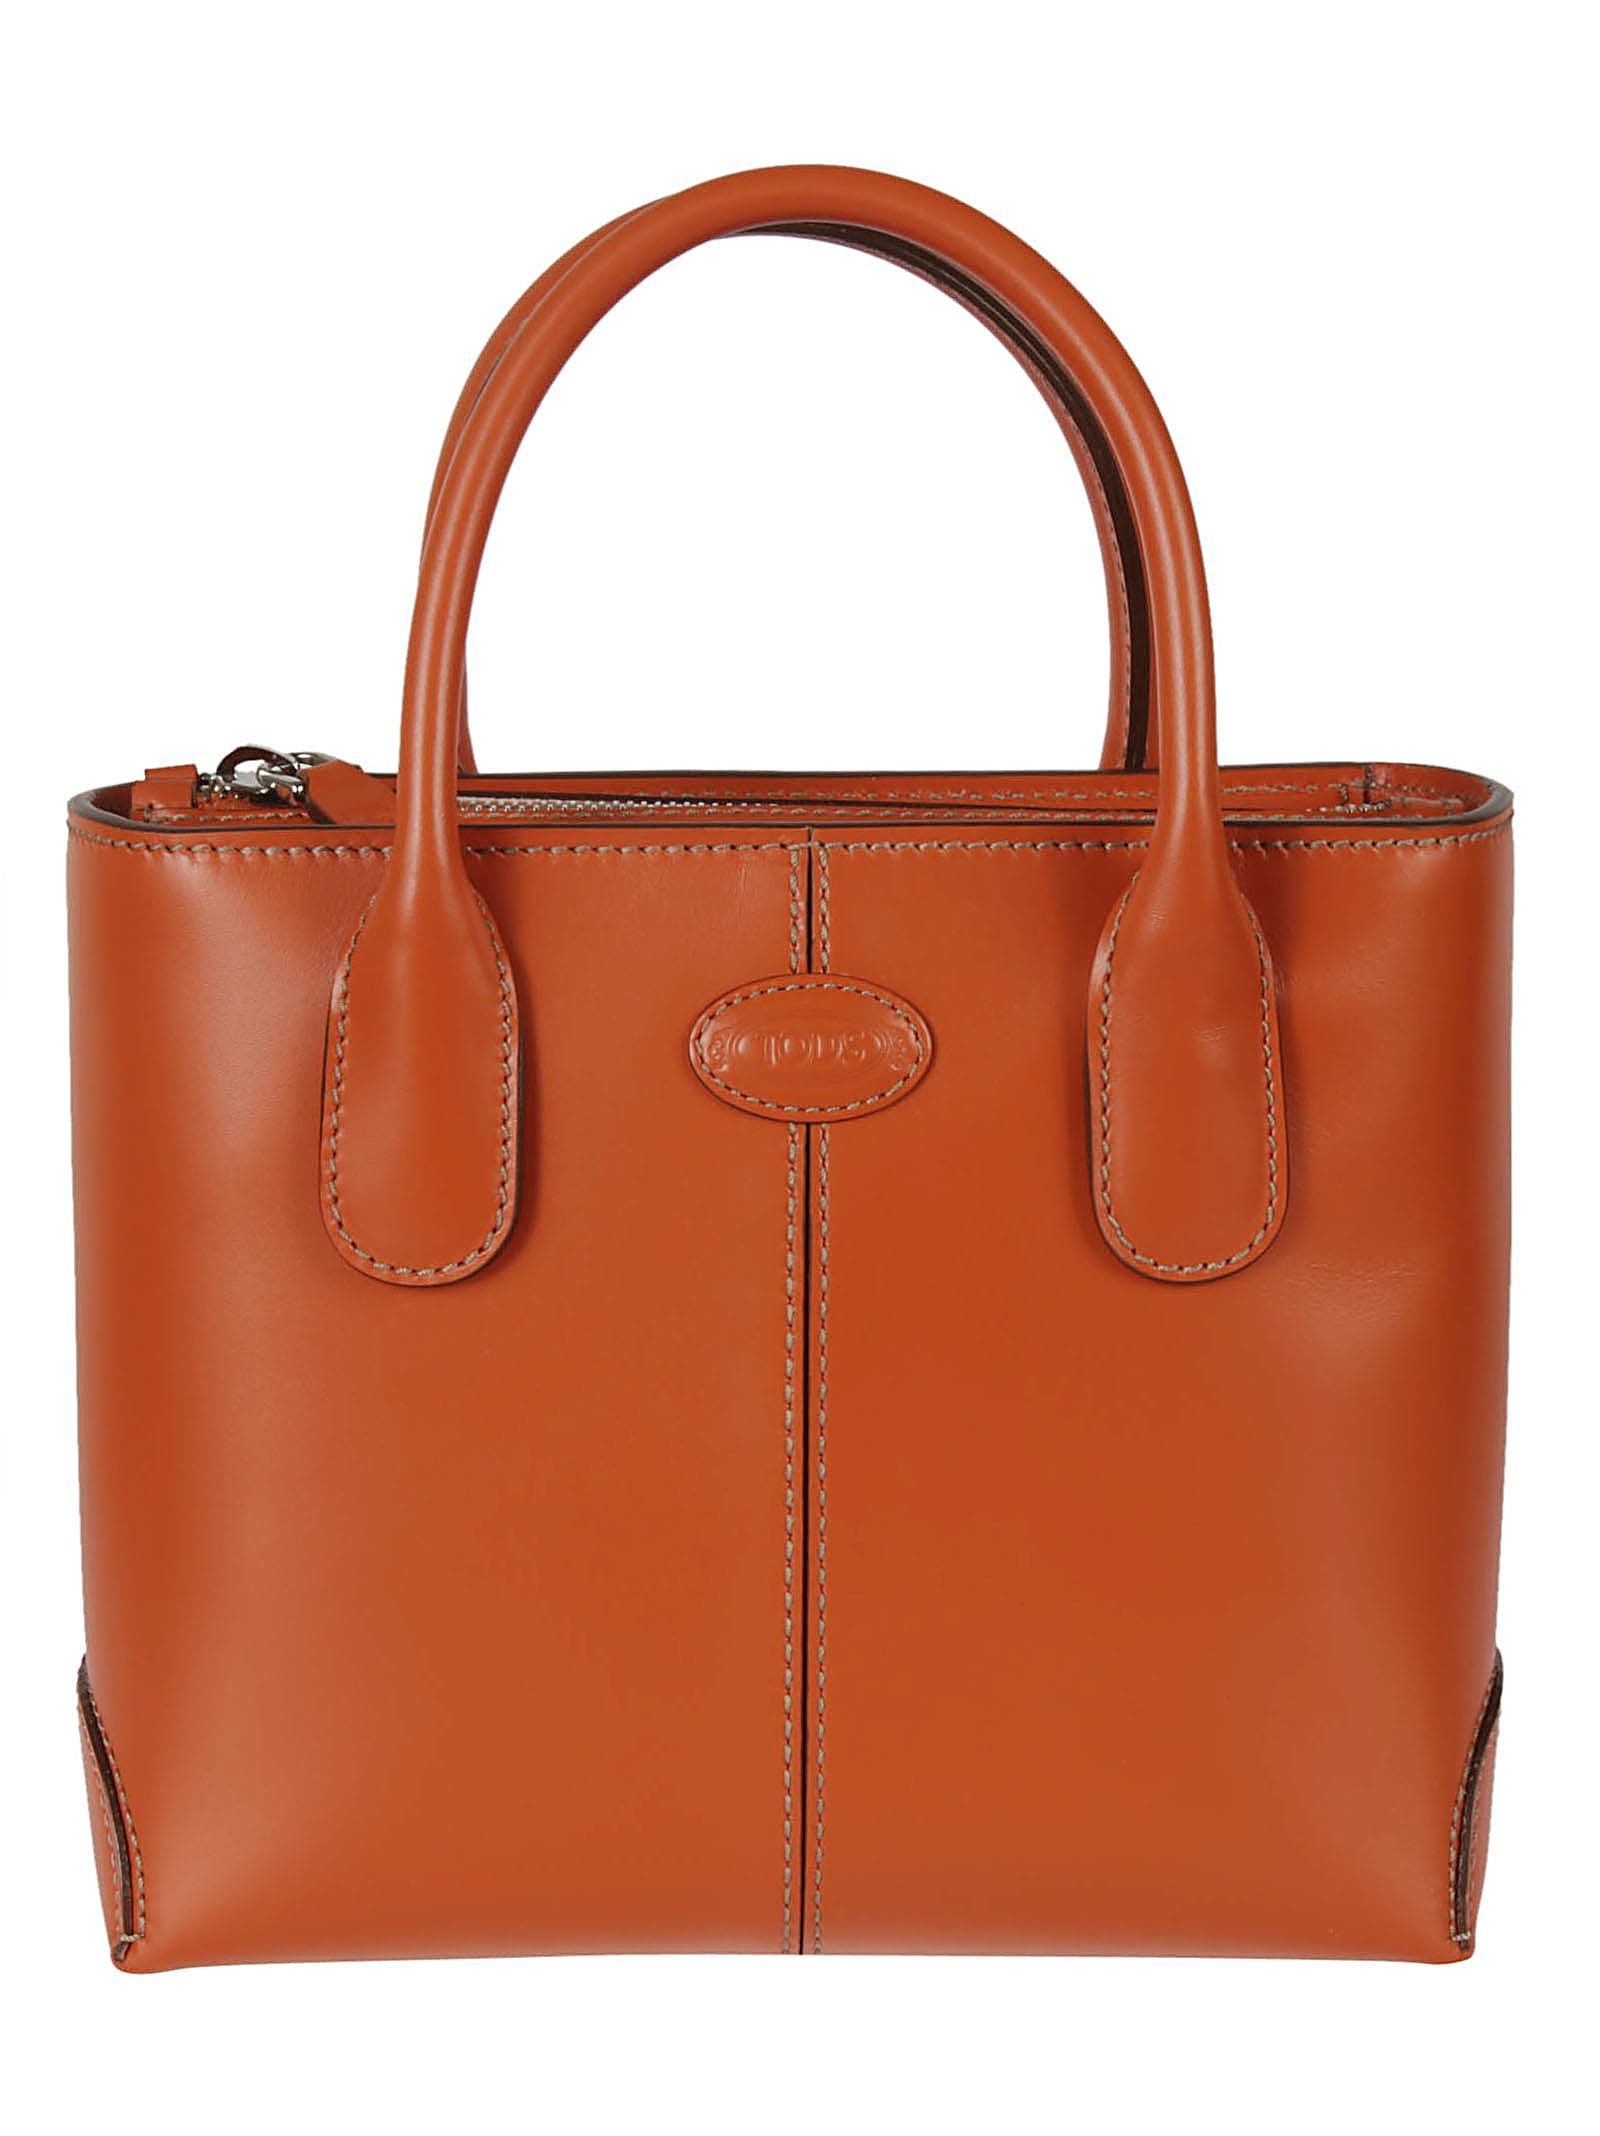 Tods Mini Shopping Bag